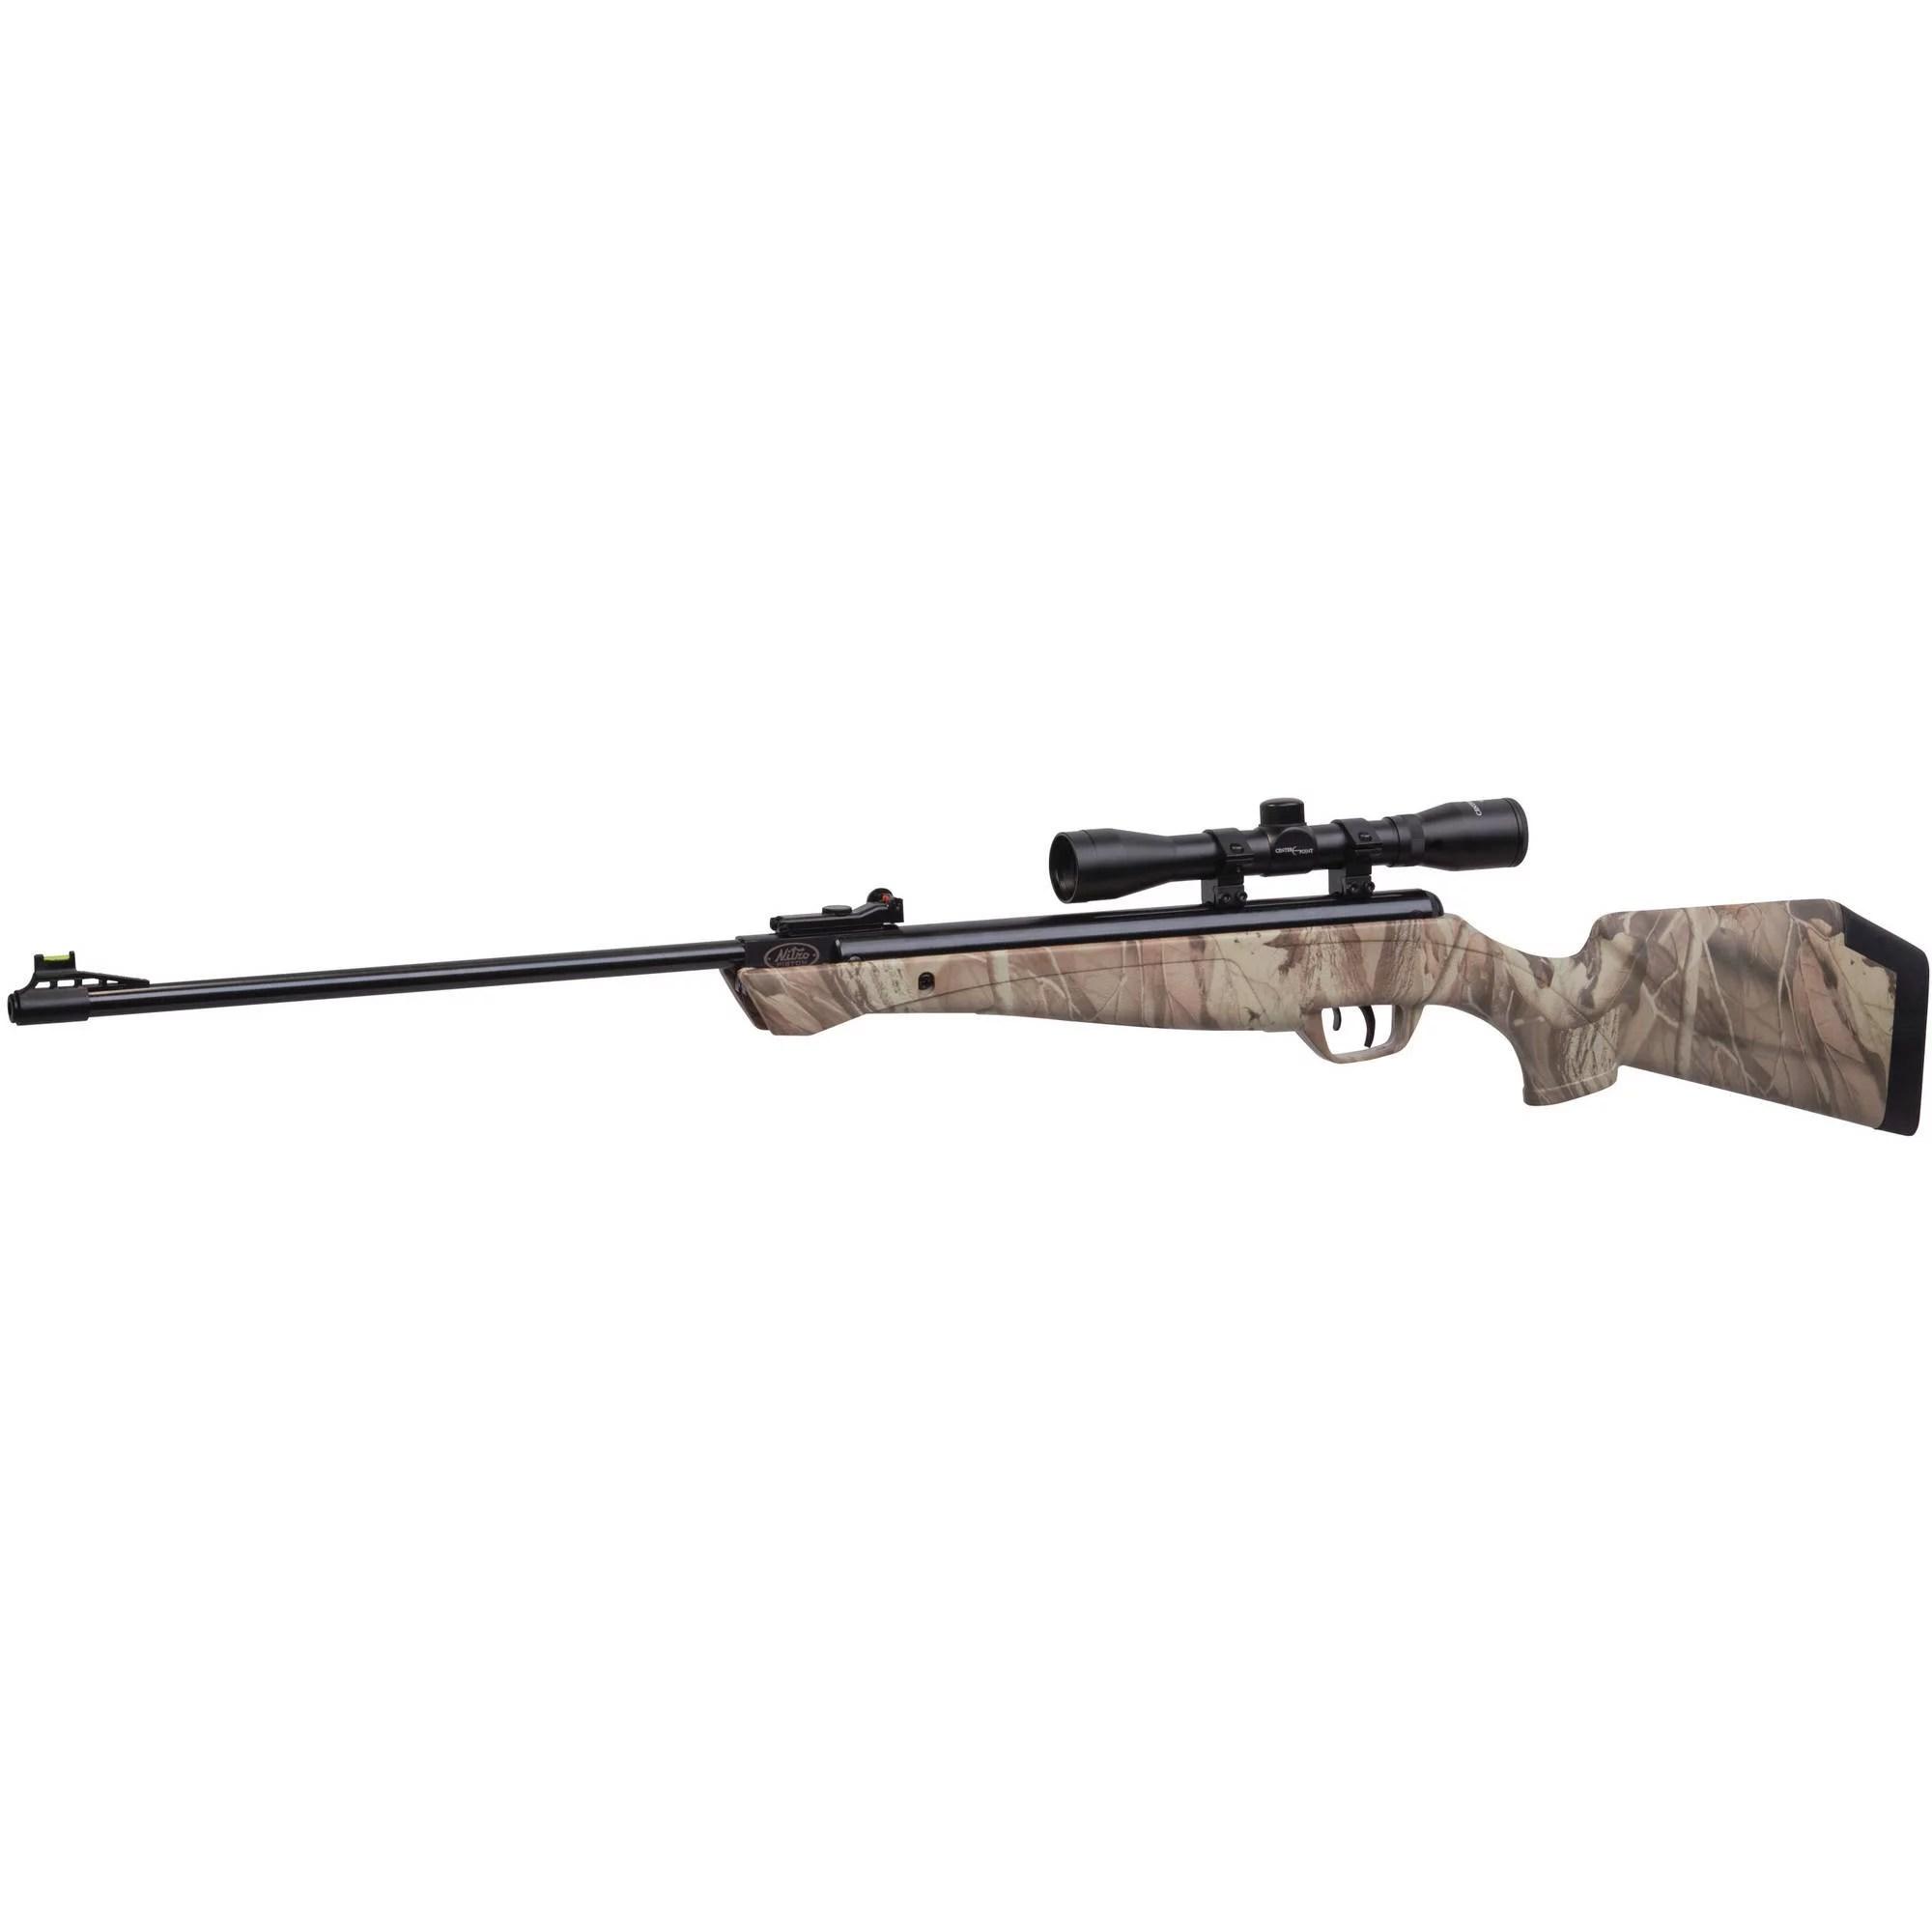 Crosman Phantom Hunter Camo Np Break Barrel Air Rifle With